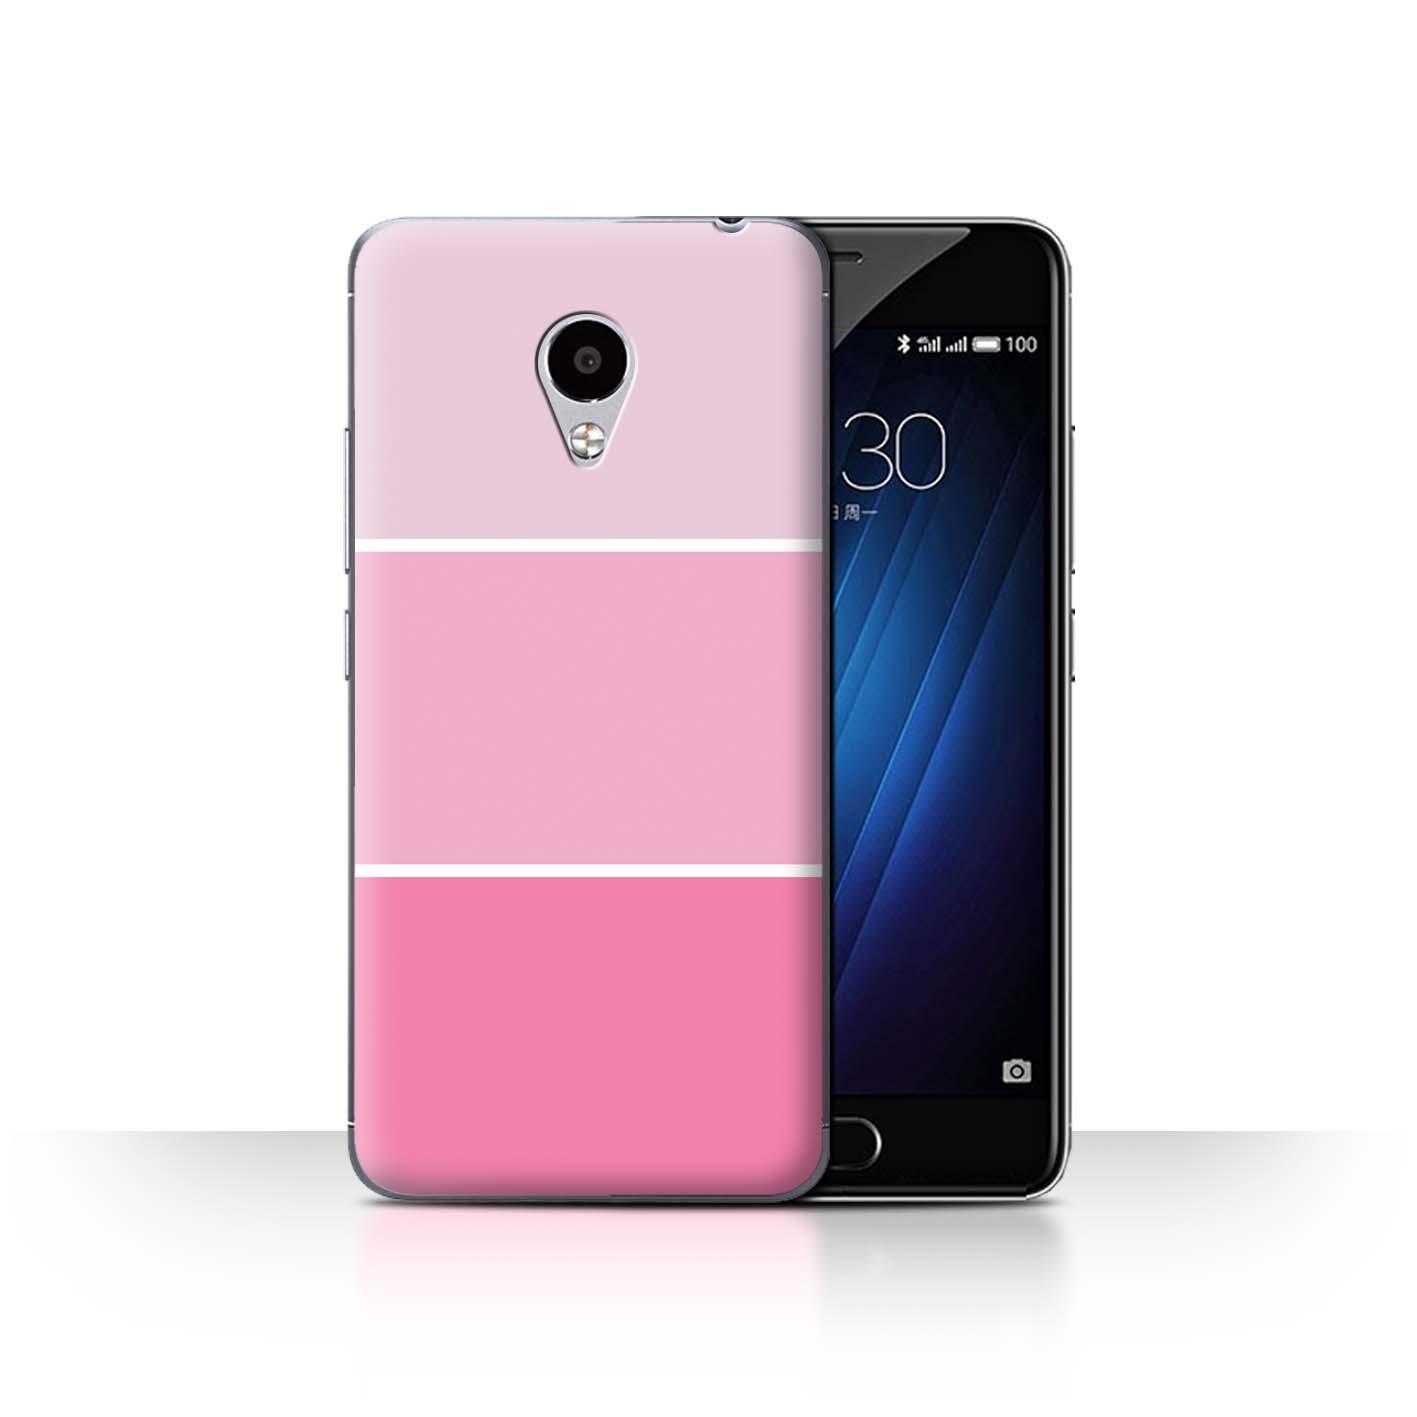 STUFF4-Back-Case-Cover-Skin-for-Meizu-M3S-Pastel-Colour-Tones